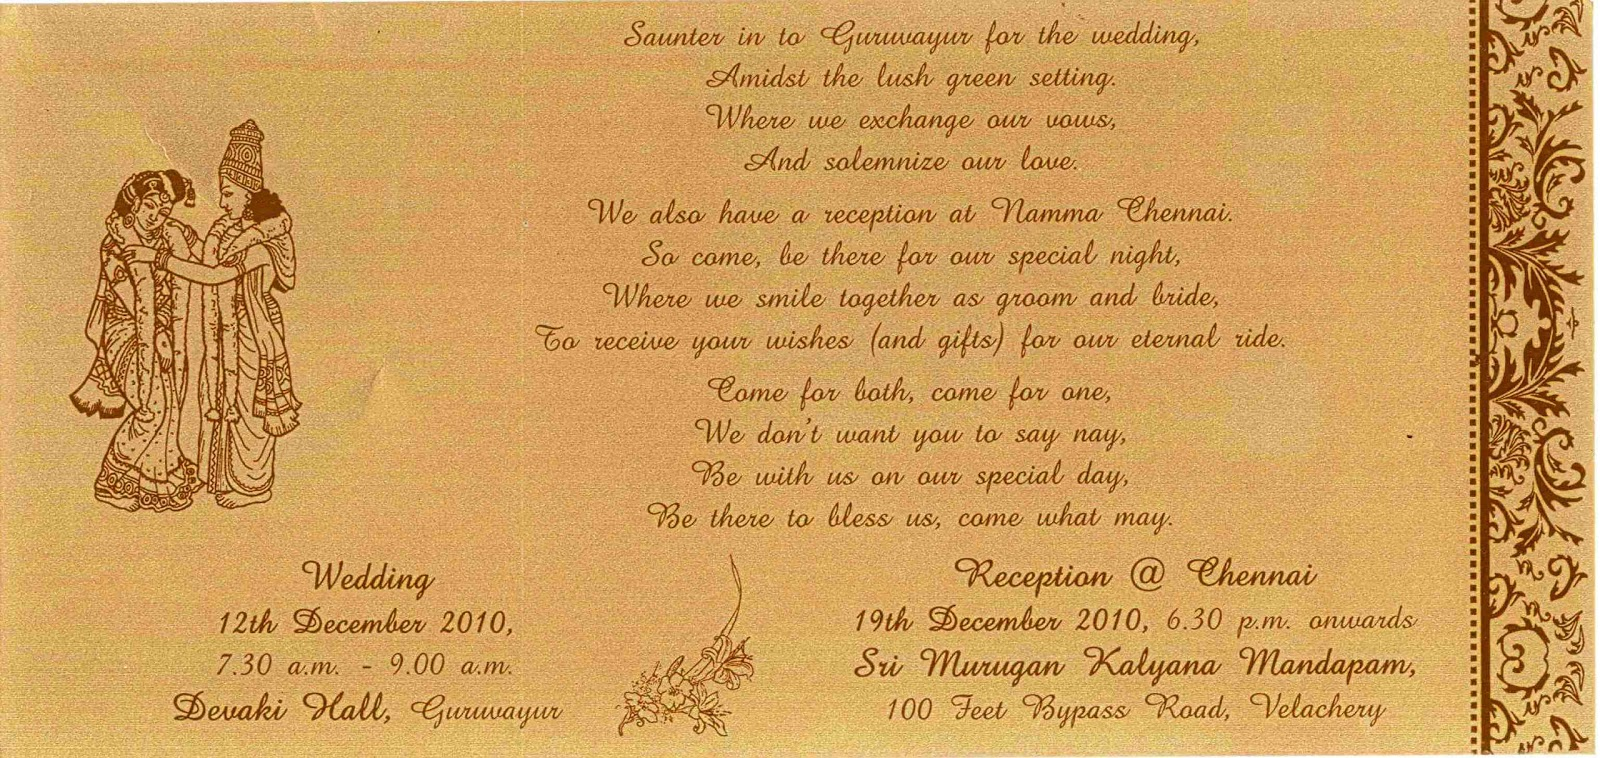 Tamil brahmin wedding invitation cards 28 images tamil iyer tamil stopboris Gallery